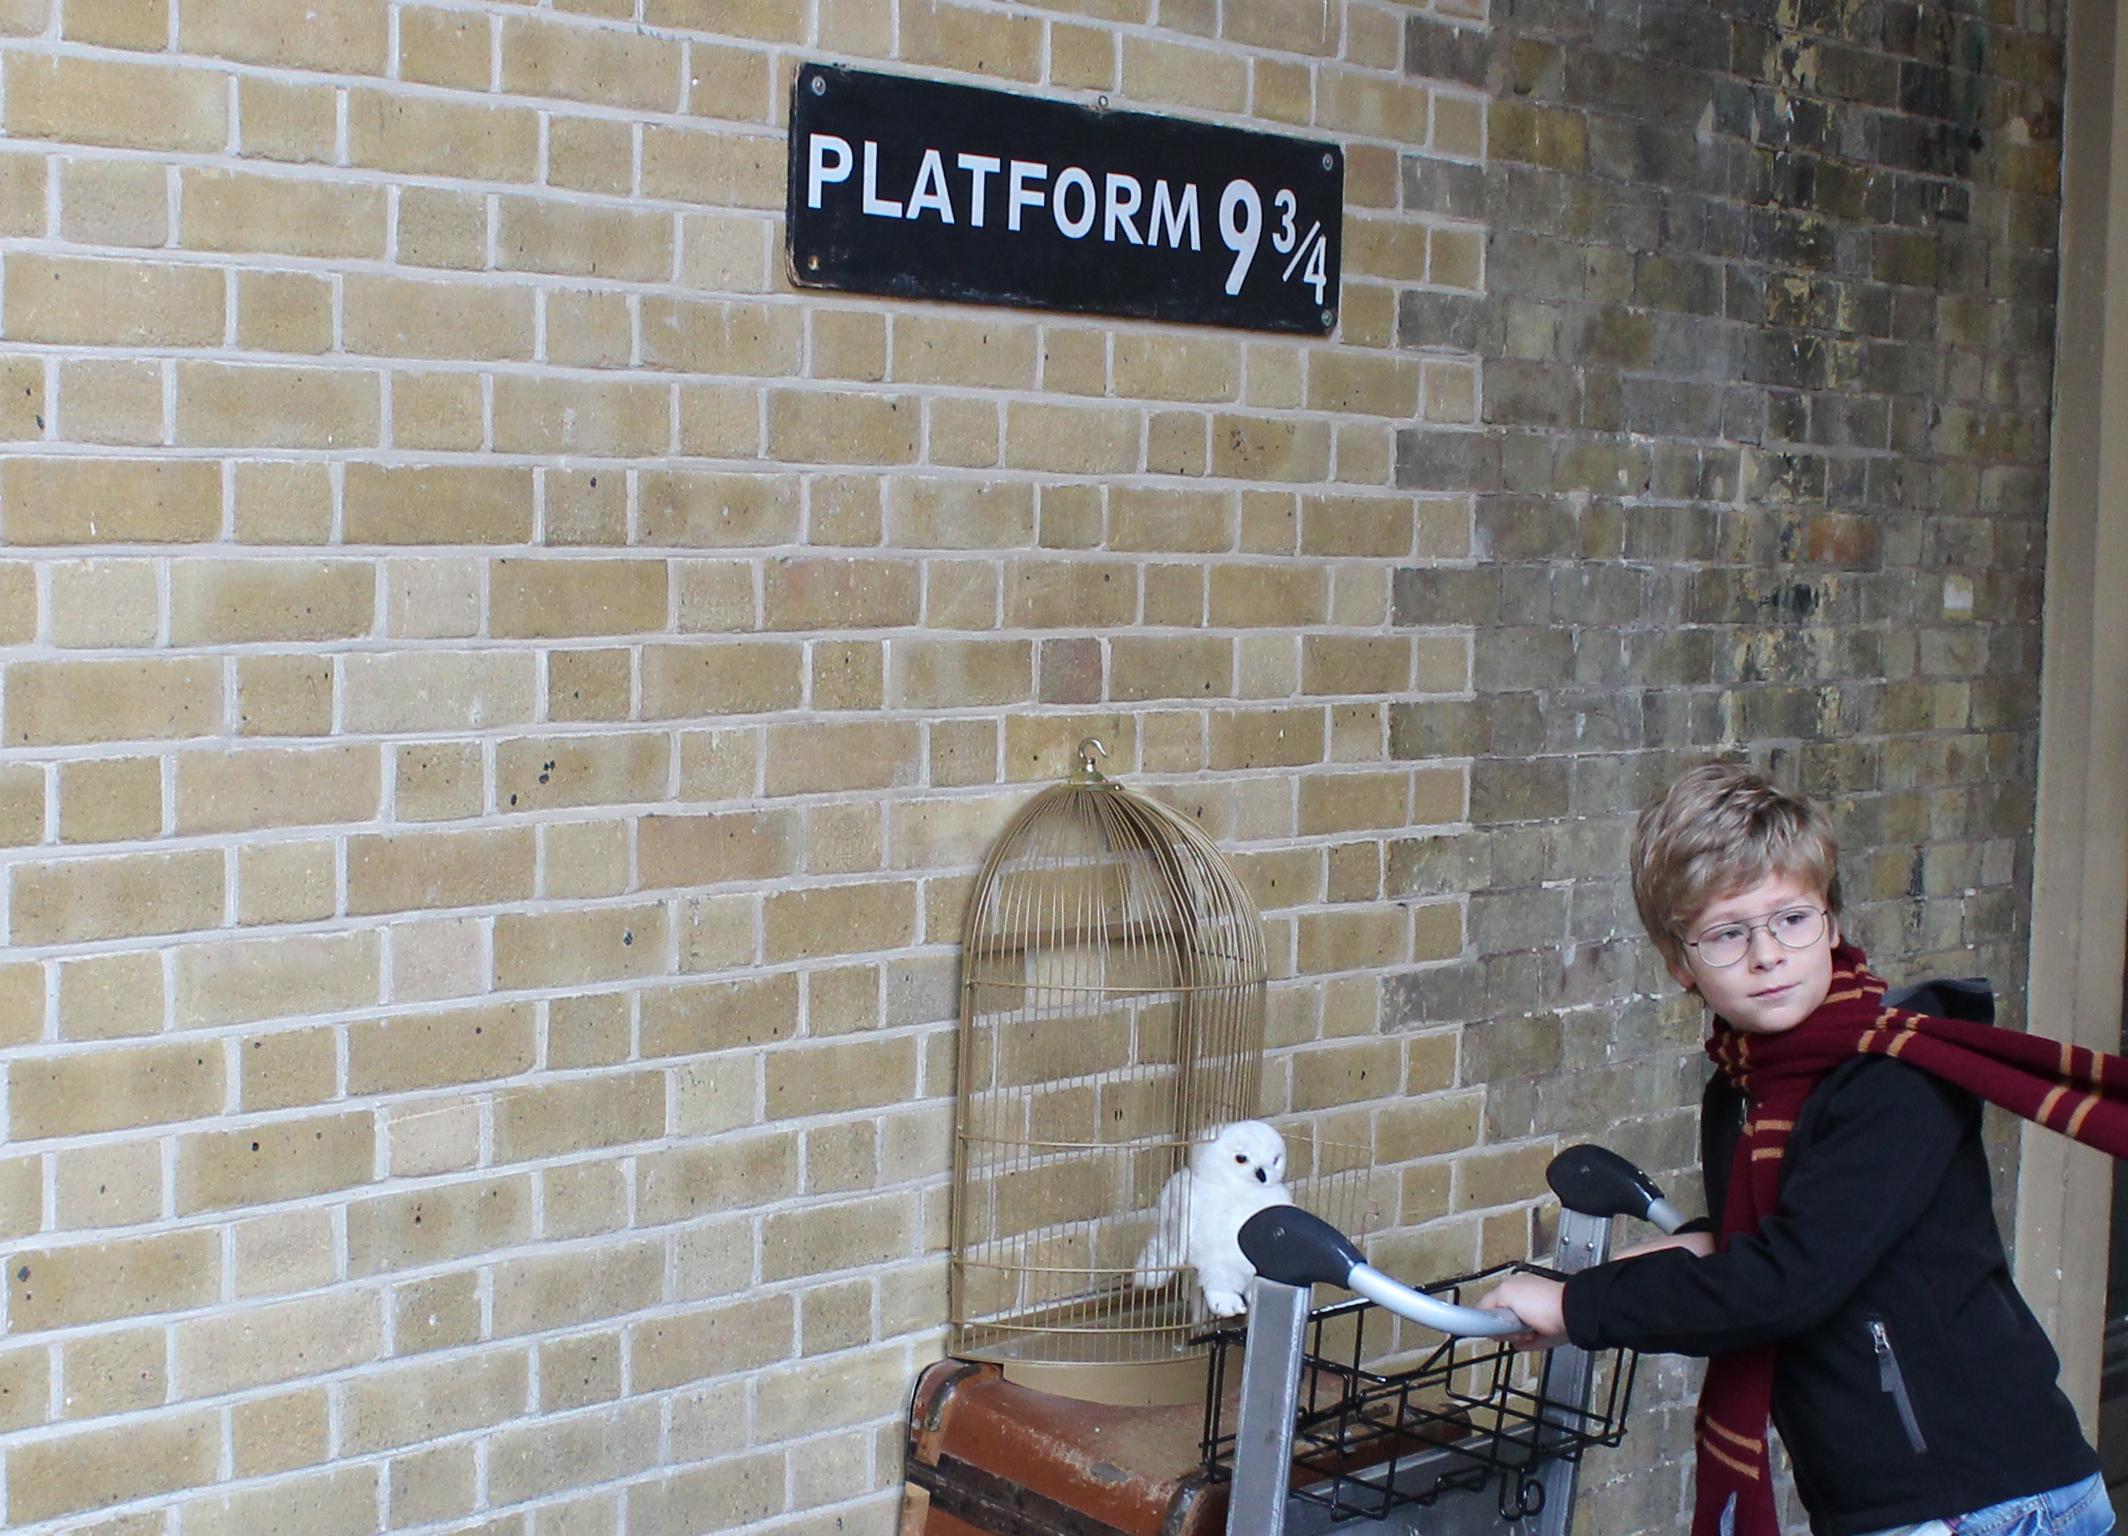 Platform 9¾ on the Harry Potter London Tour